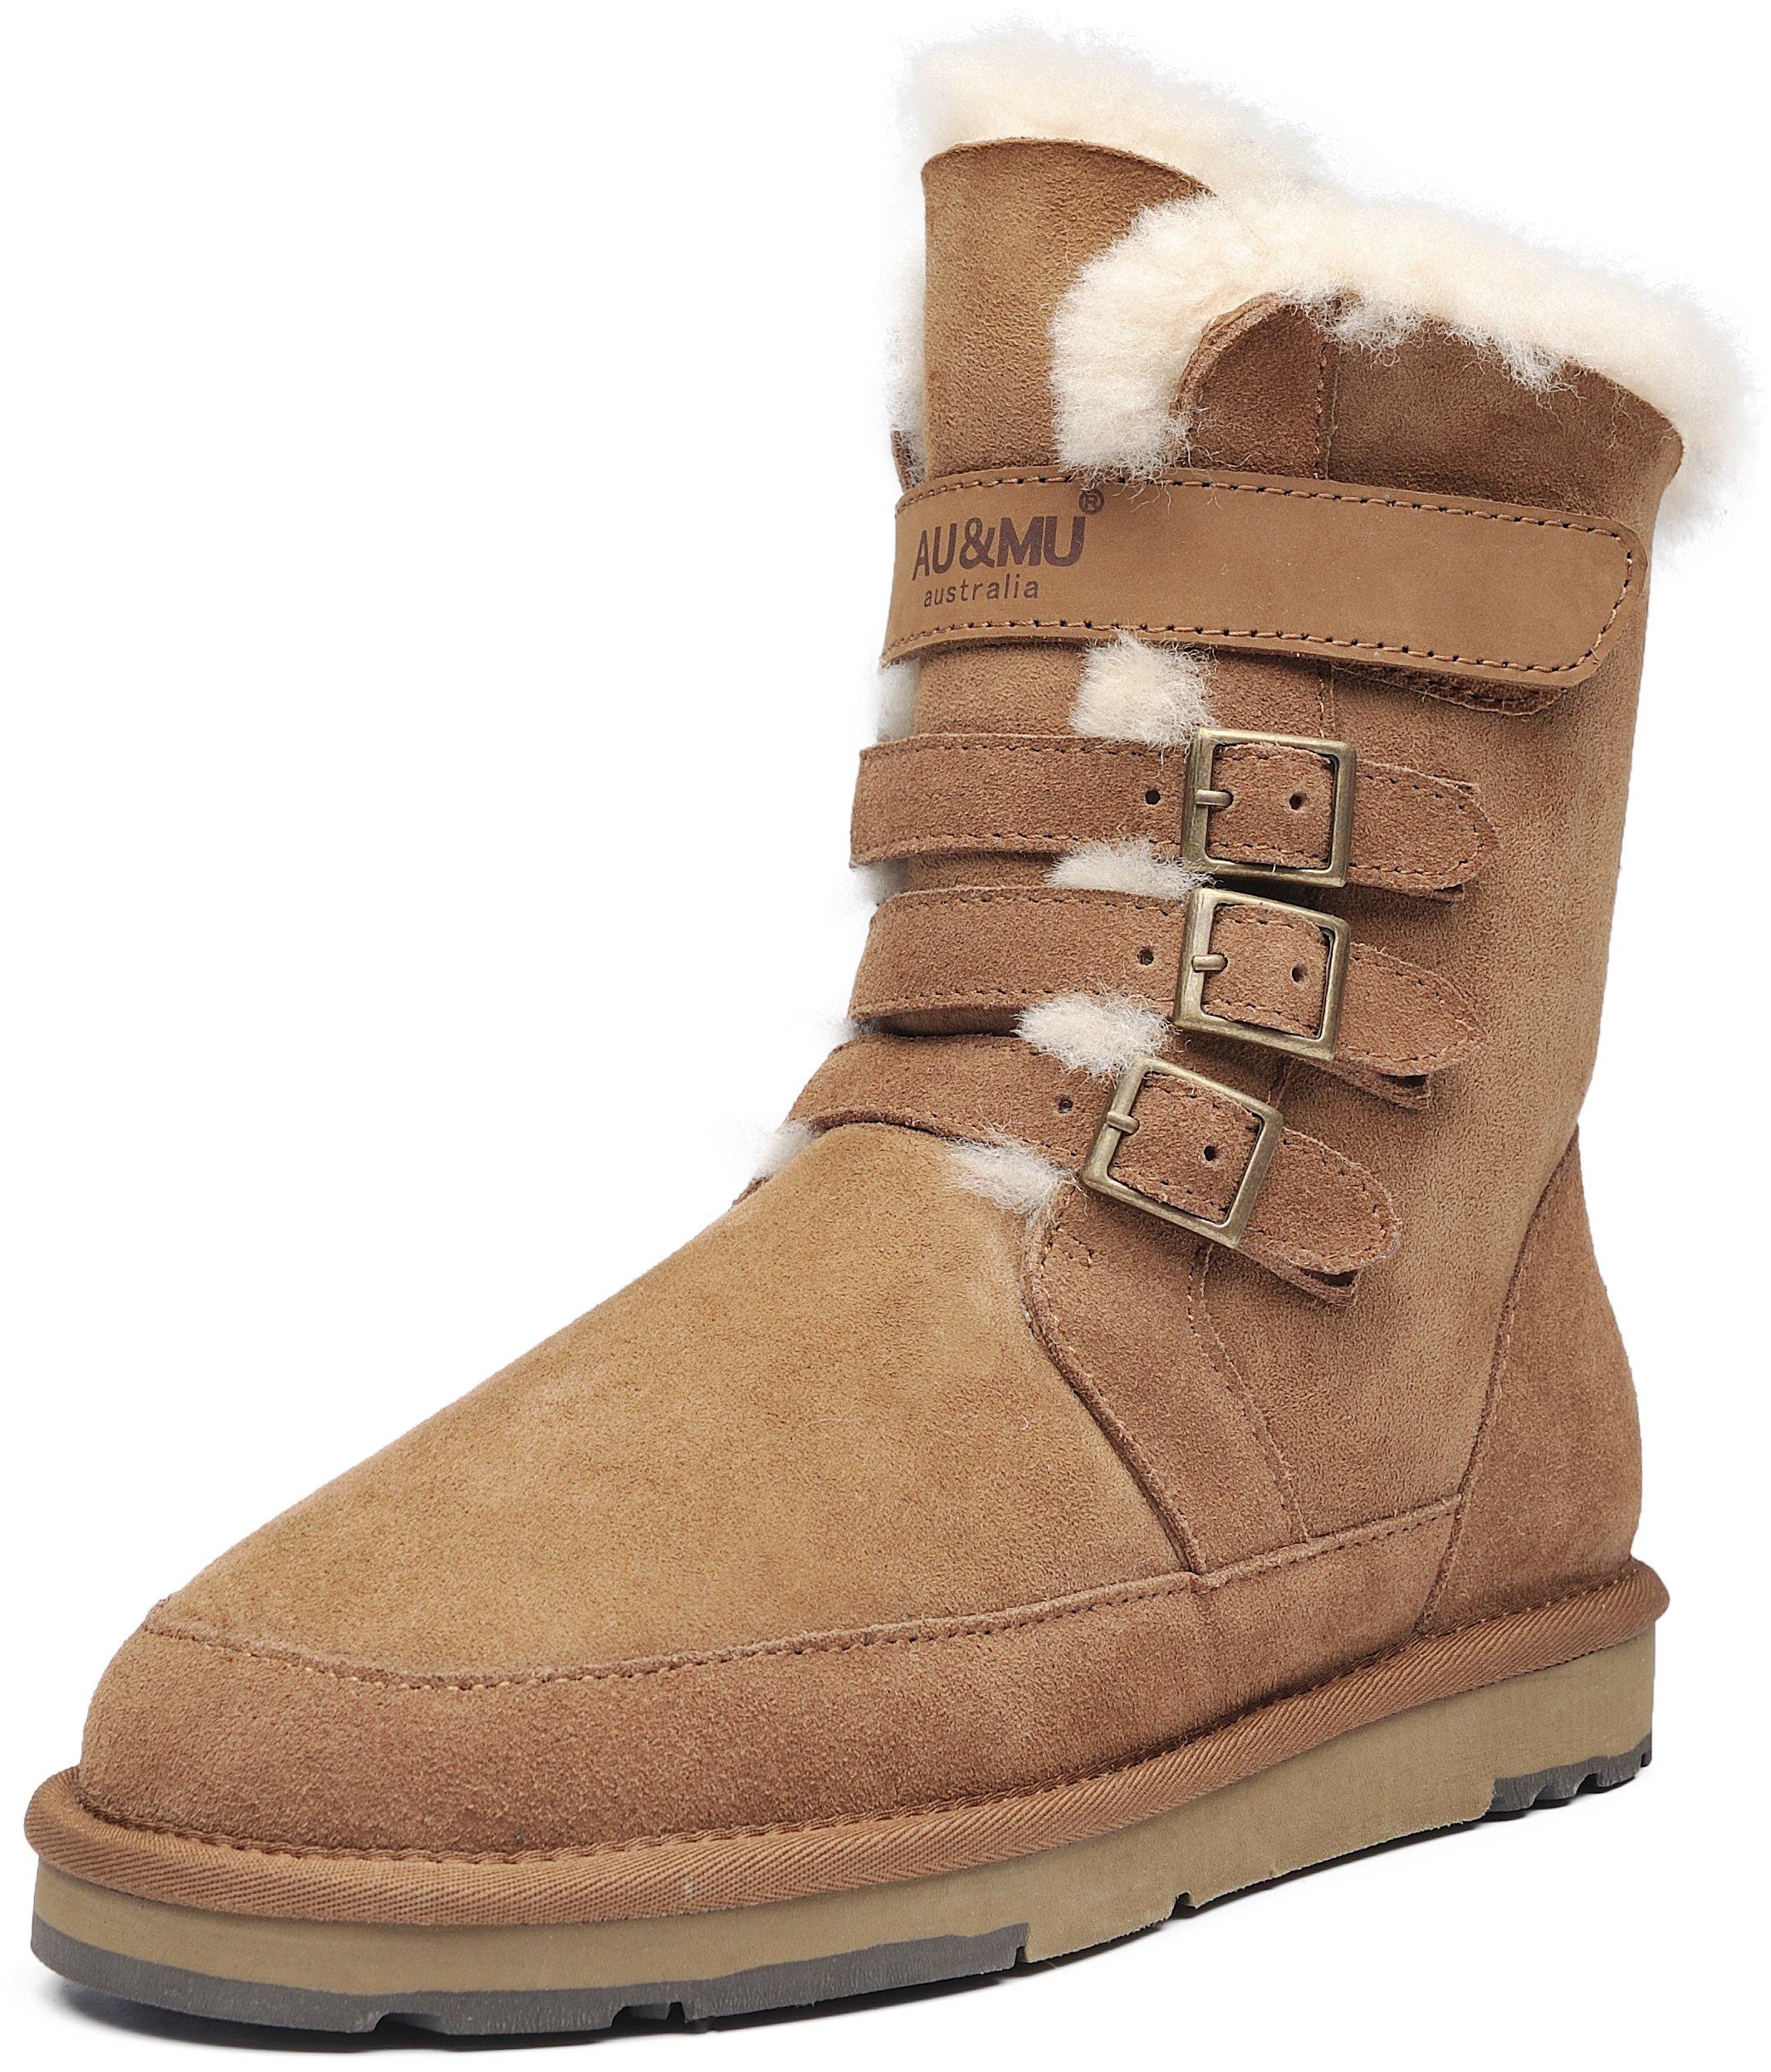 AU&MU AUMU Womens Mid Calf Snow Boots Short Winter Boots Chestnut Size 8